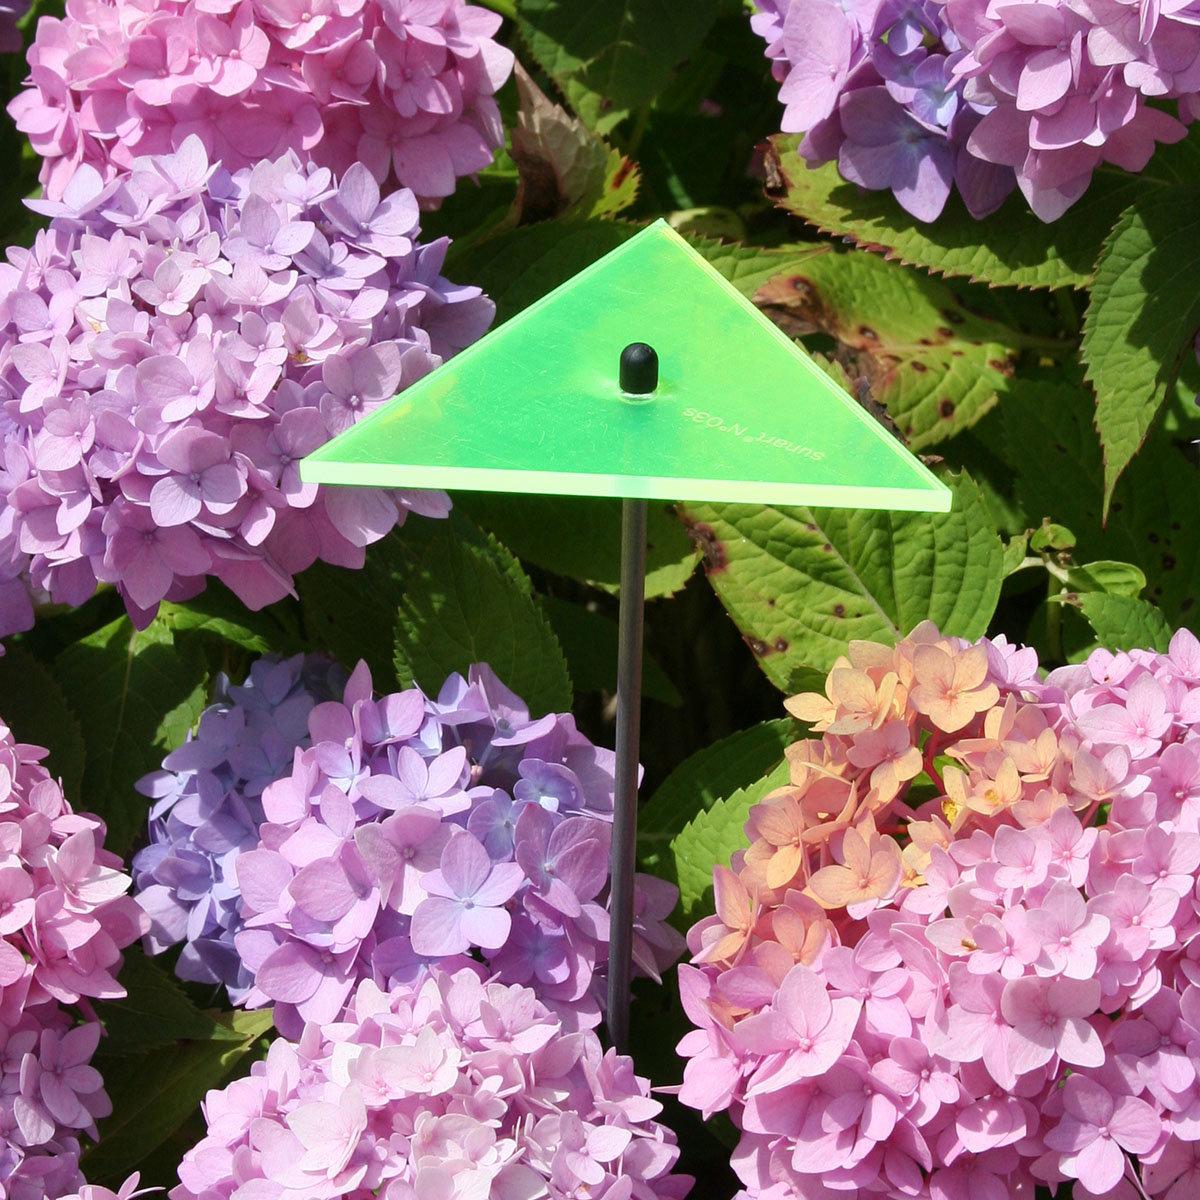 sunart® Acrylglas Lichtfänger, Dreieck, grün